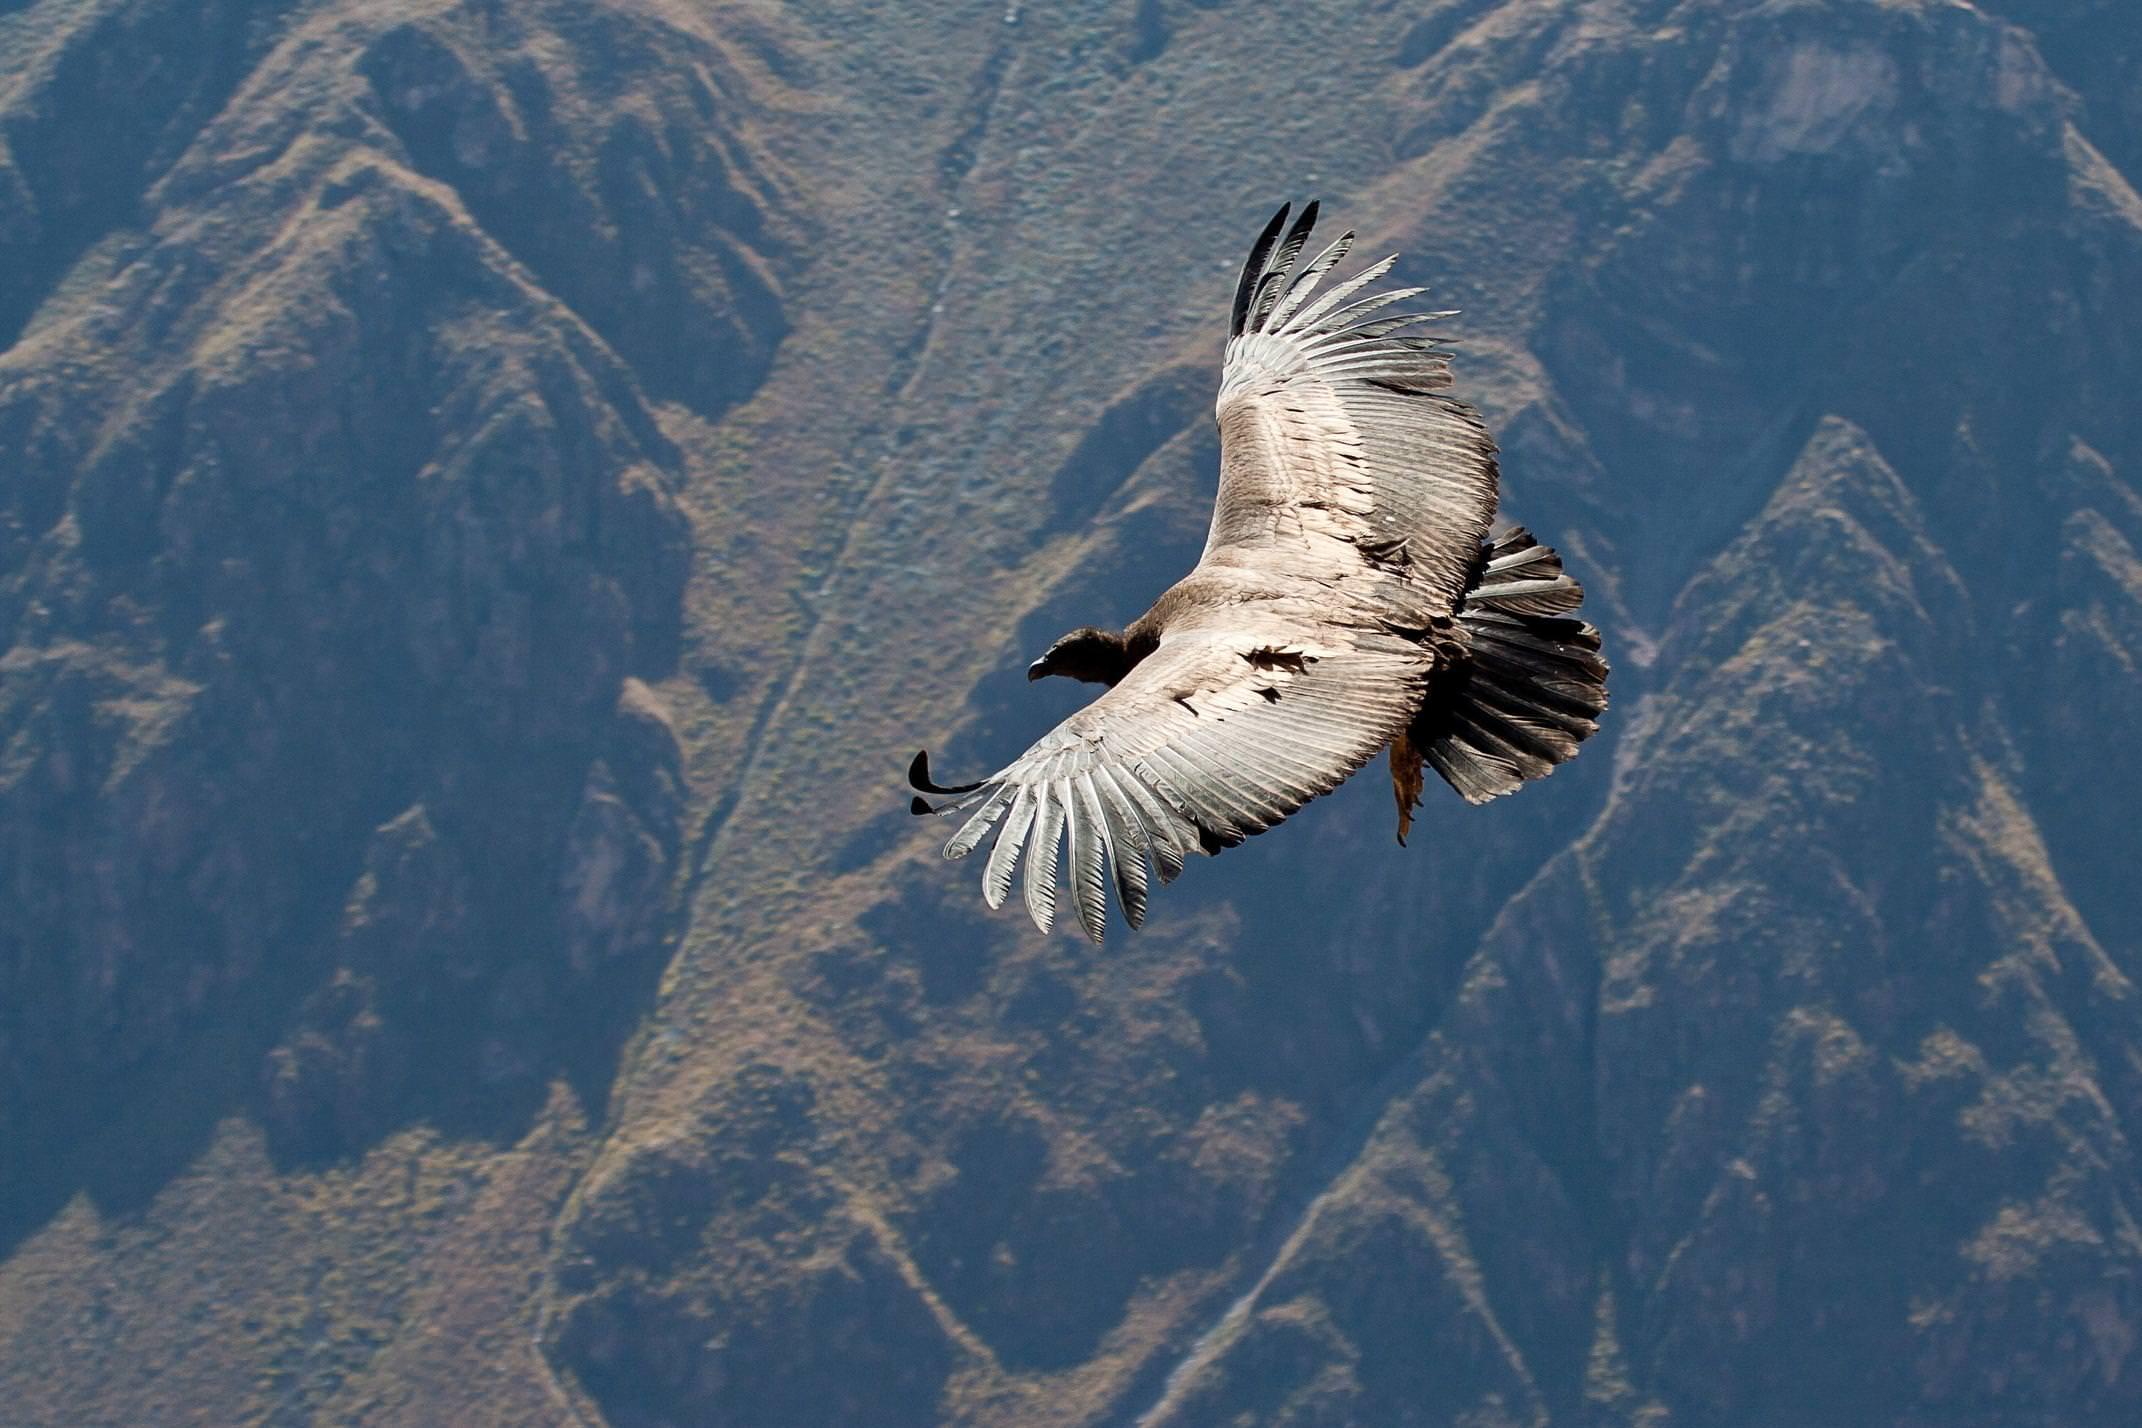 Peru colca condor flying